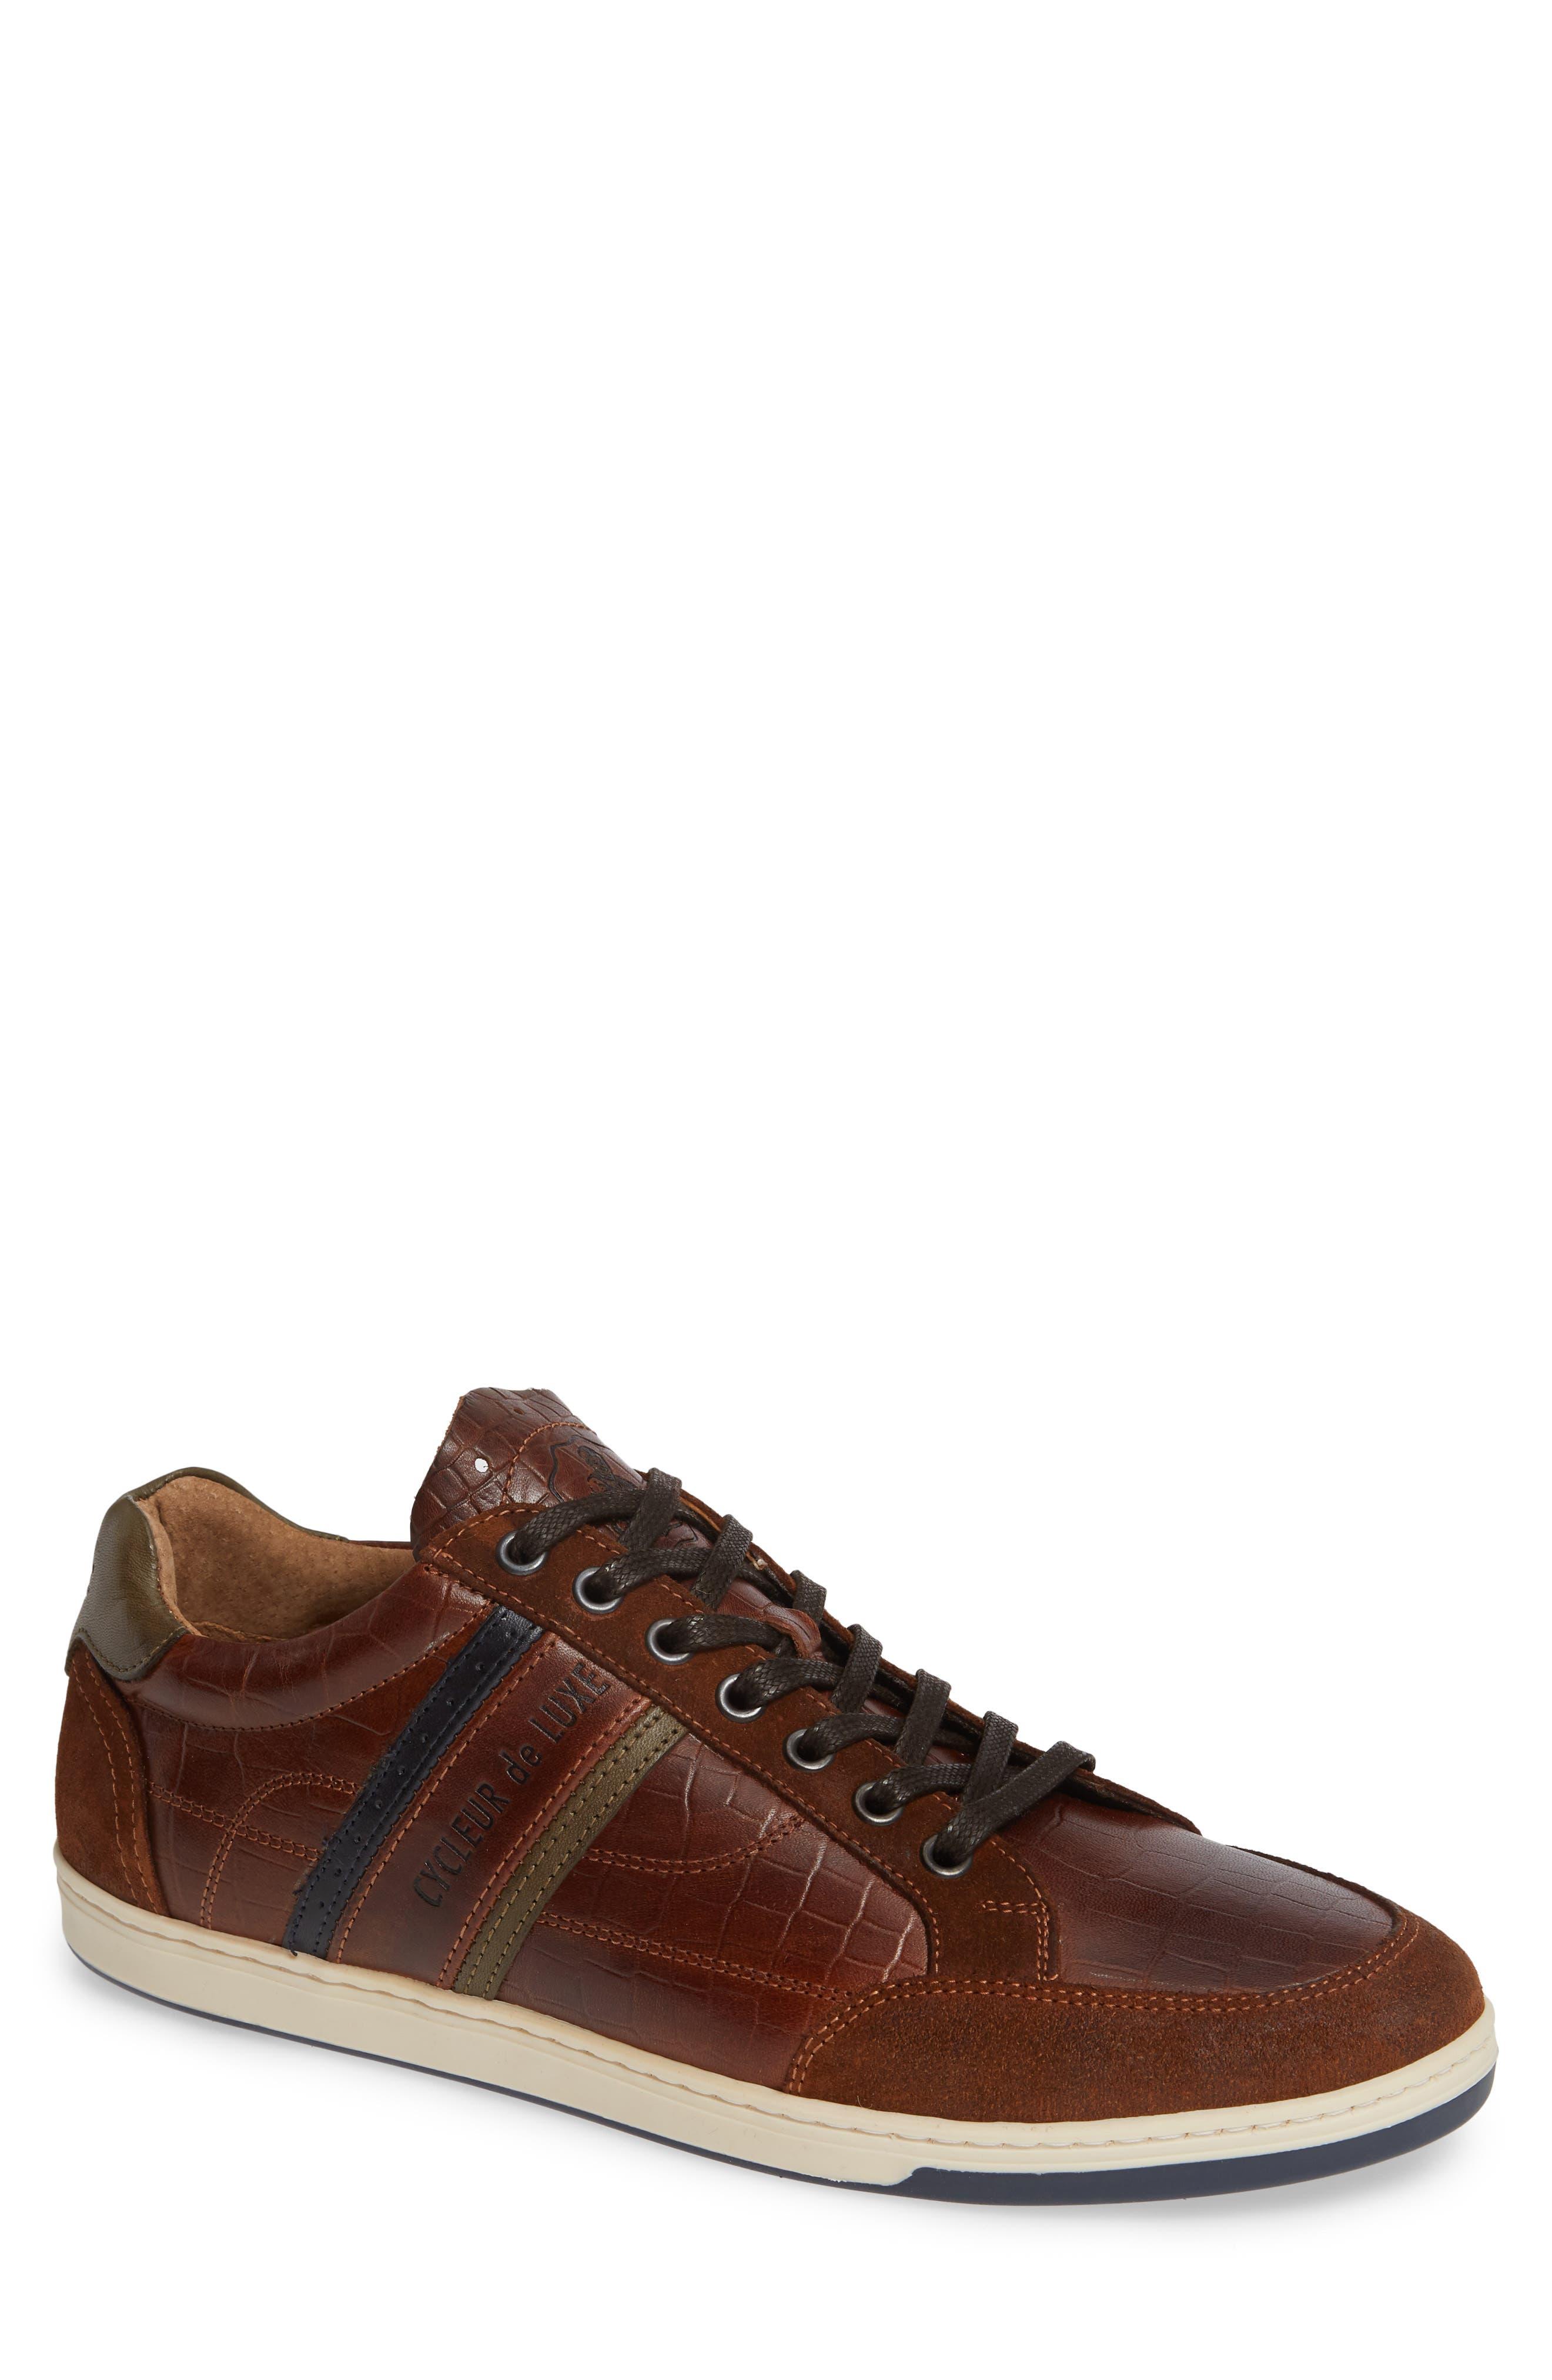 Preston Sneaker,                             Main thumbnail 1, color,                             COGNAC